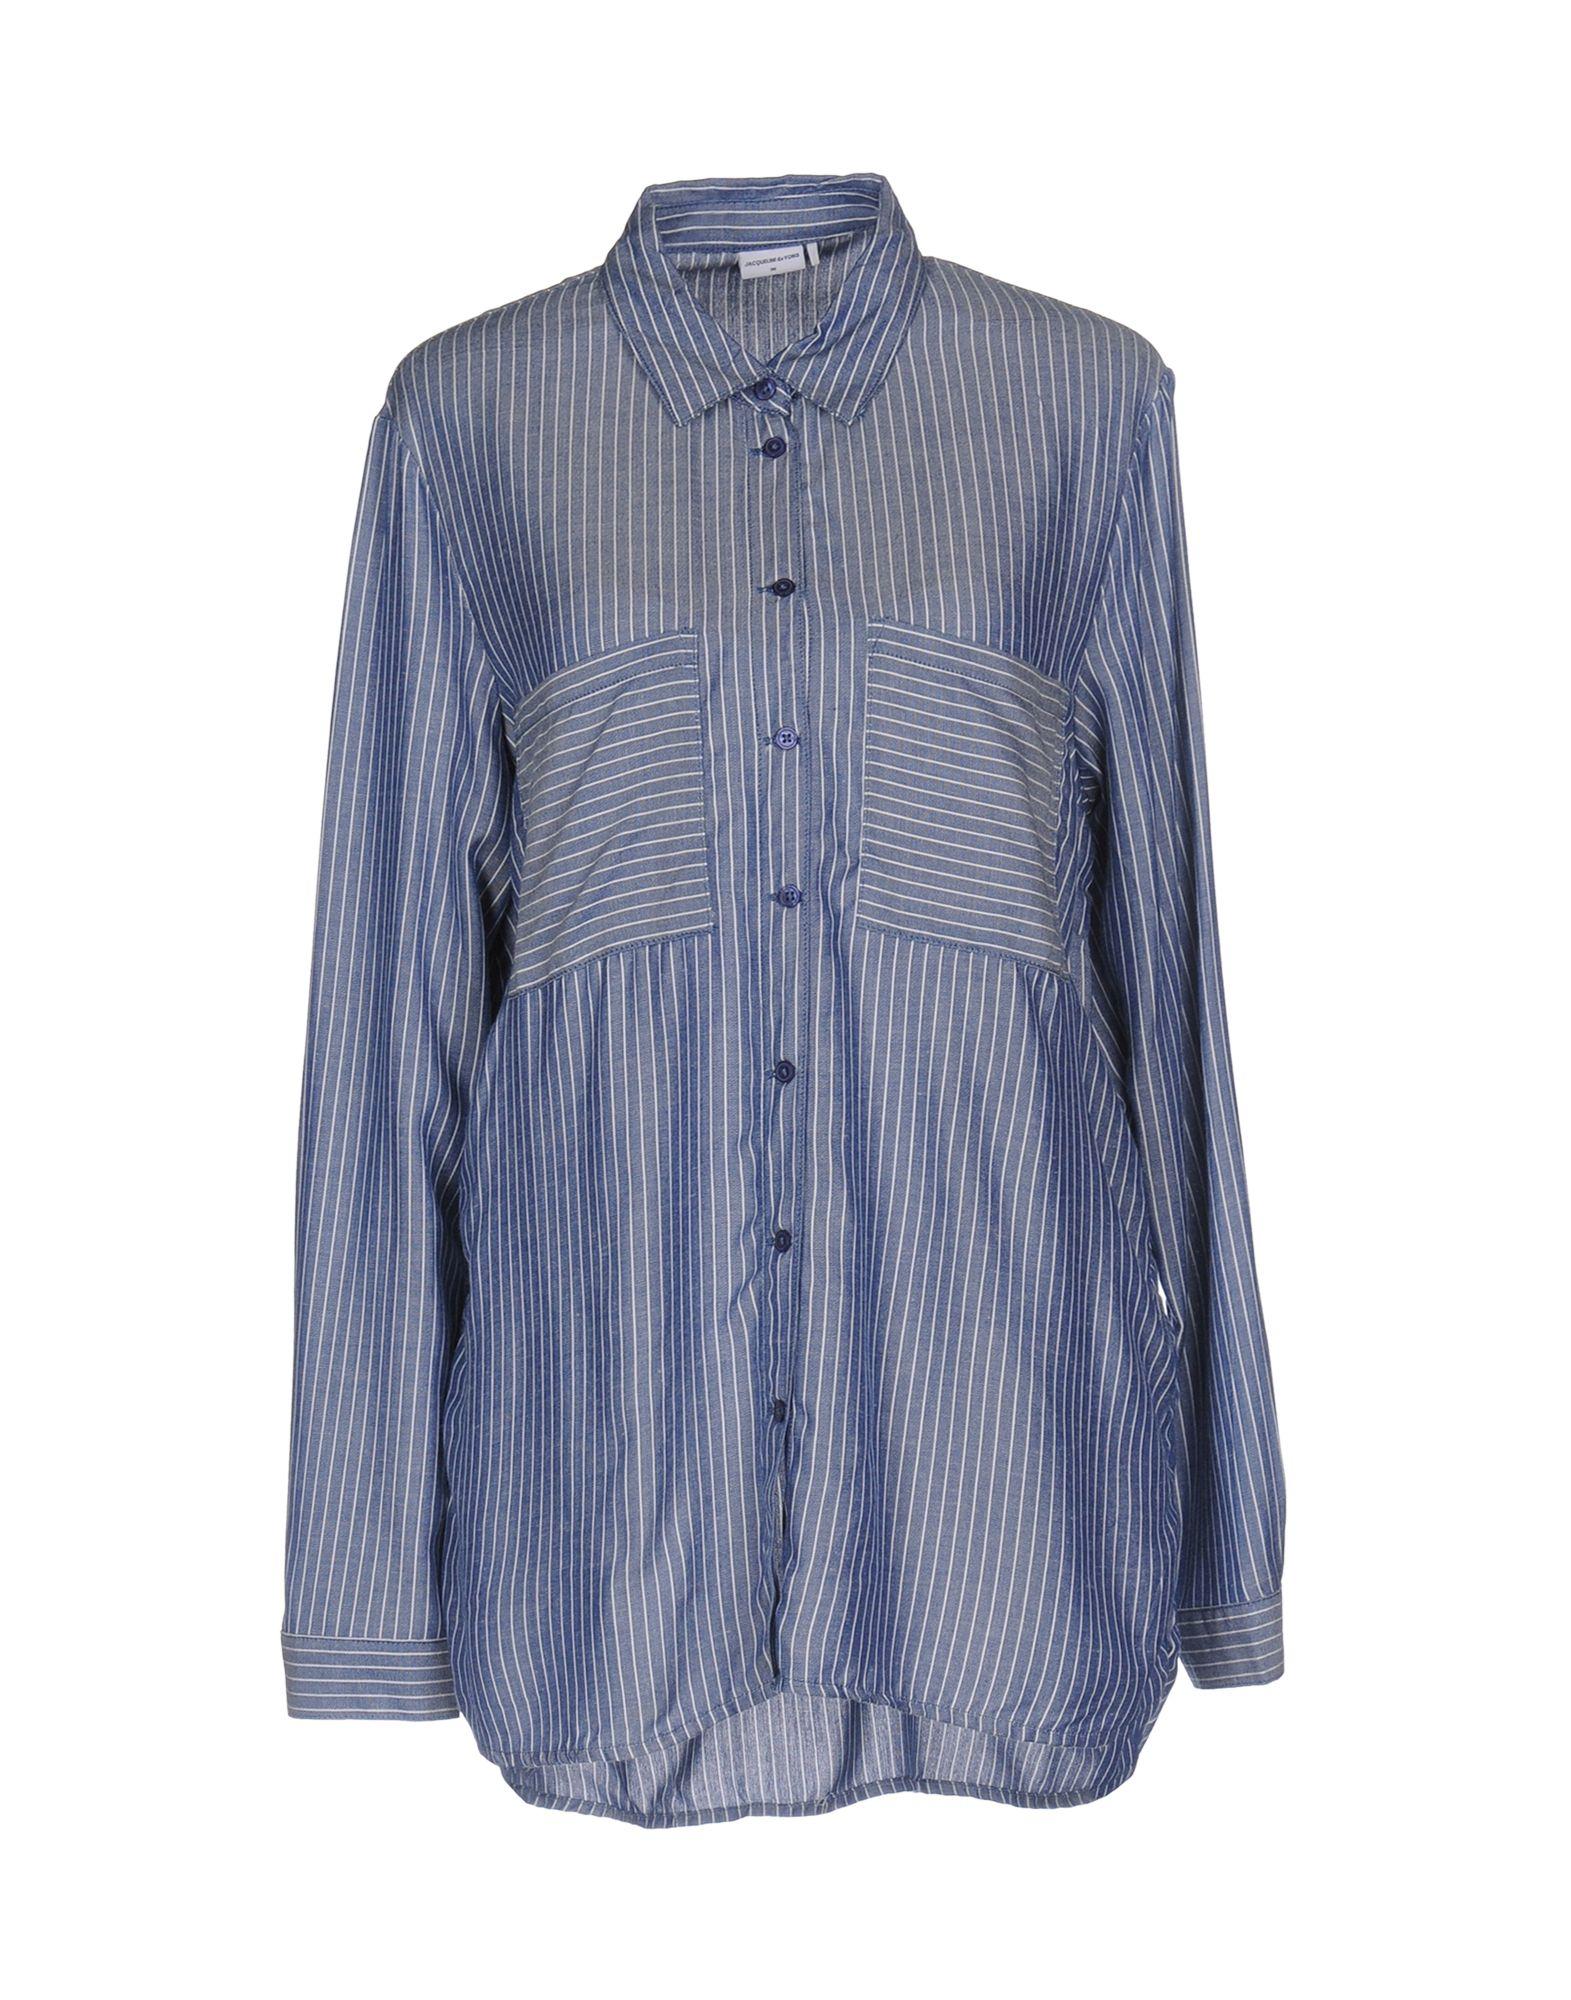 JACQUELINE de YONG Pубашка блуза jacqueline de yong jacqueline de yong ja908ewujb68